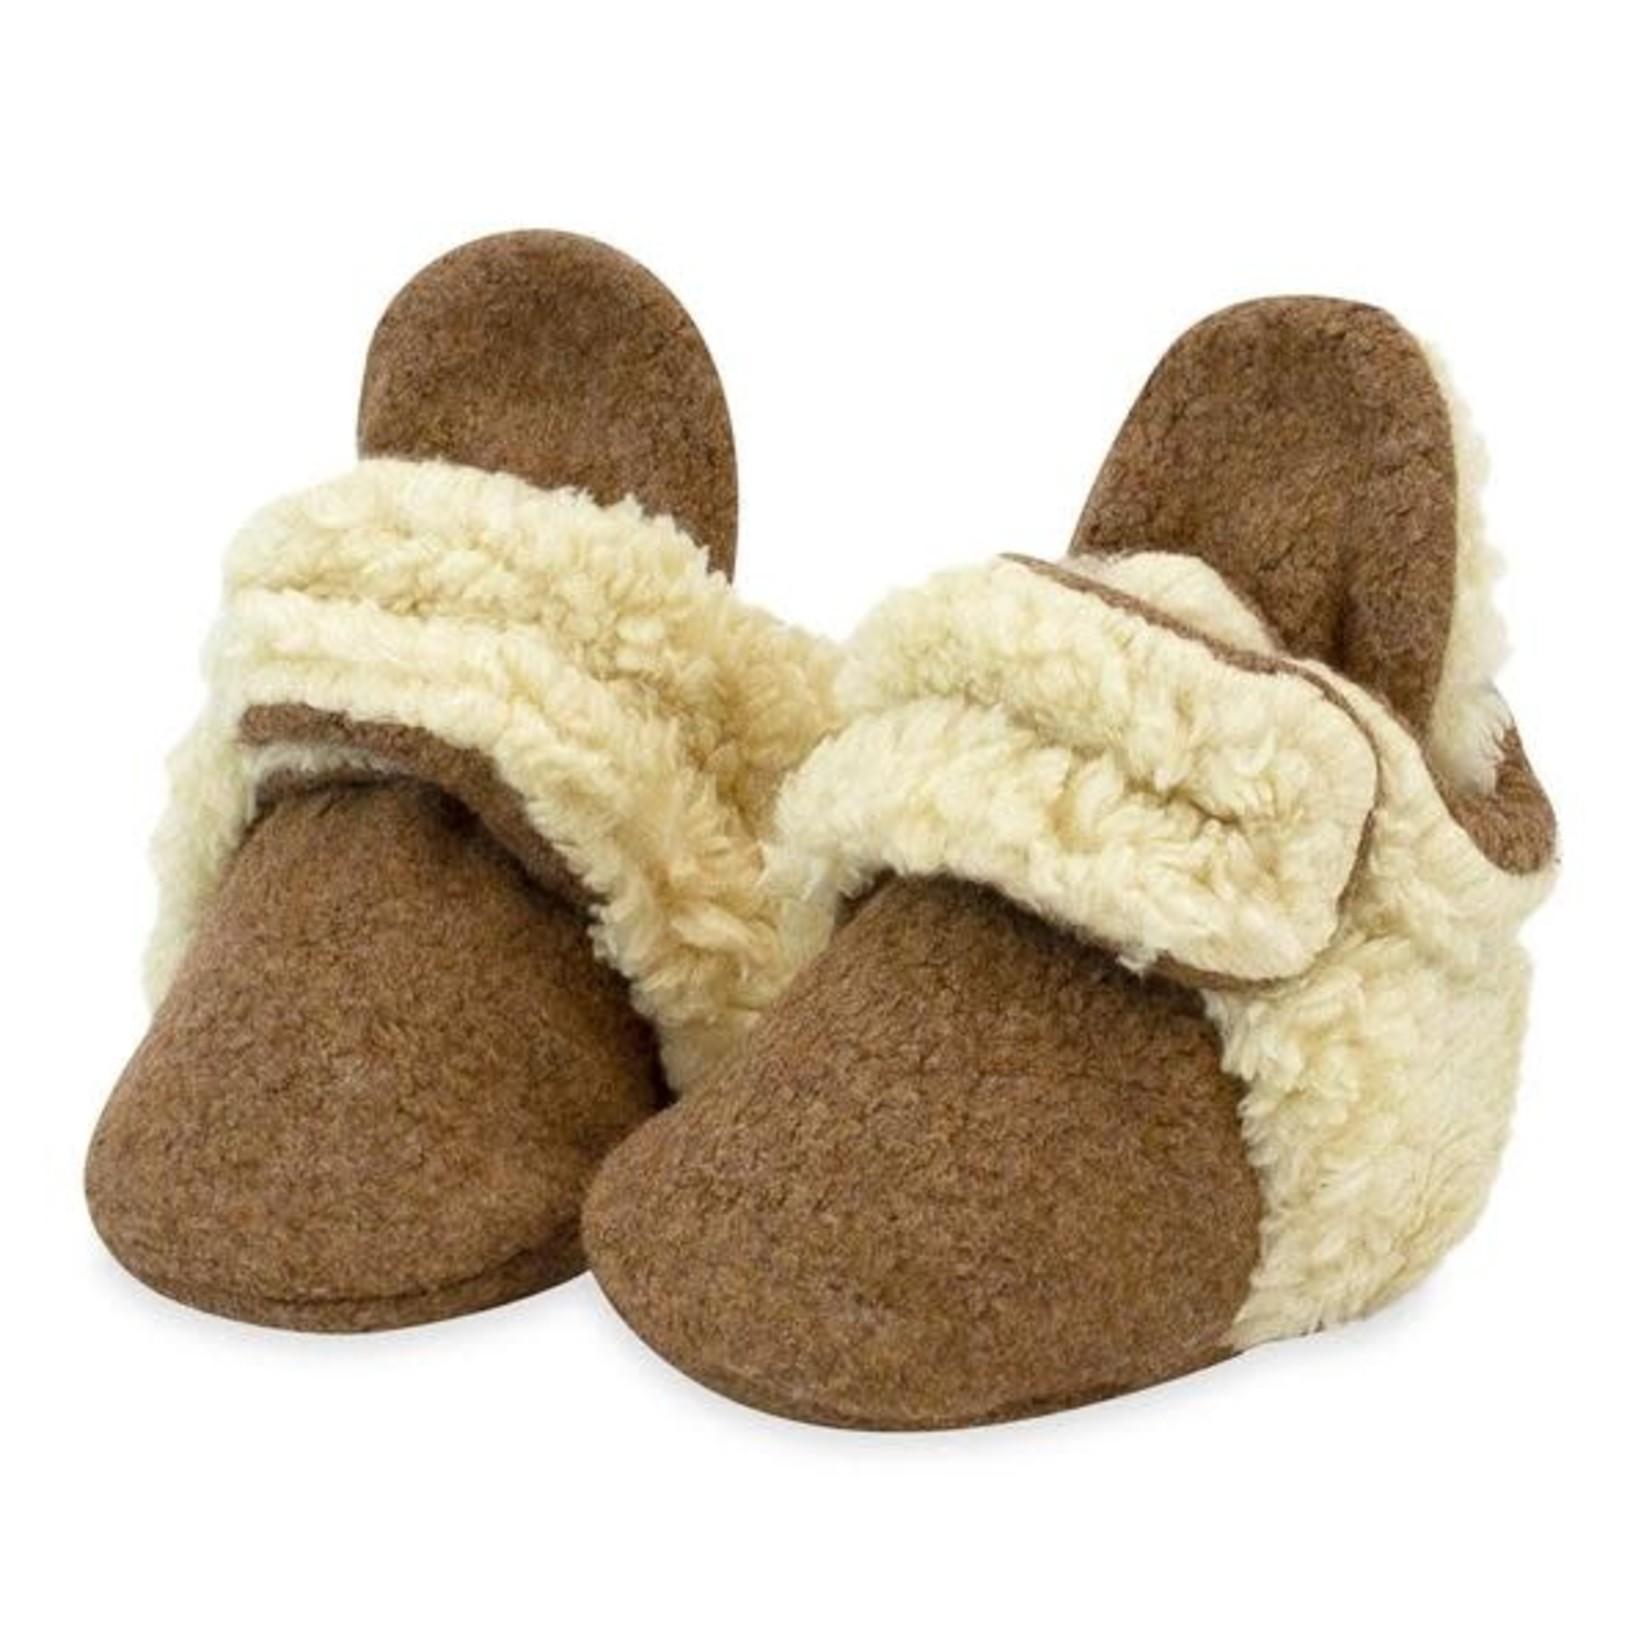 Zutano Cozie Furry Baby Bootie - Heather Mocha